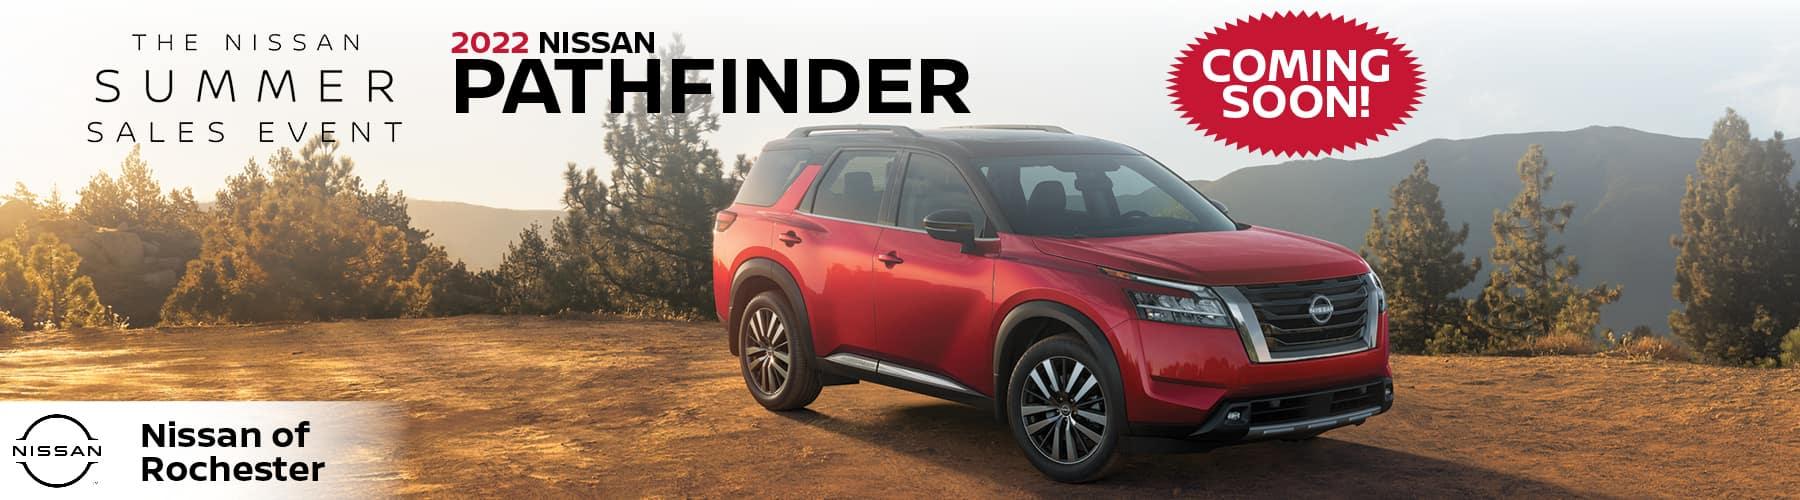 2022 Nissan Pathfinder | Nissan of Rochester